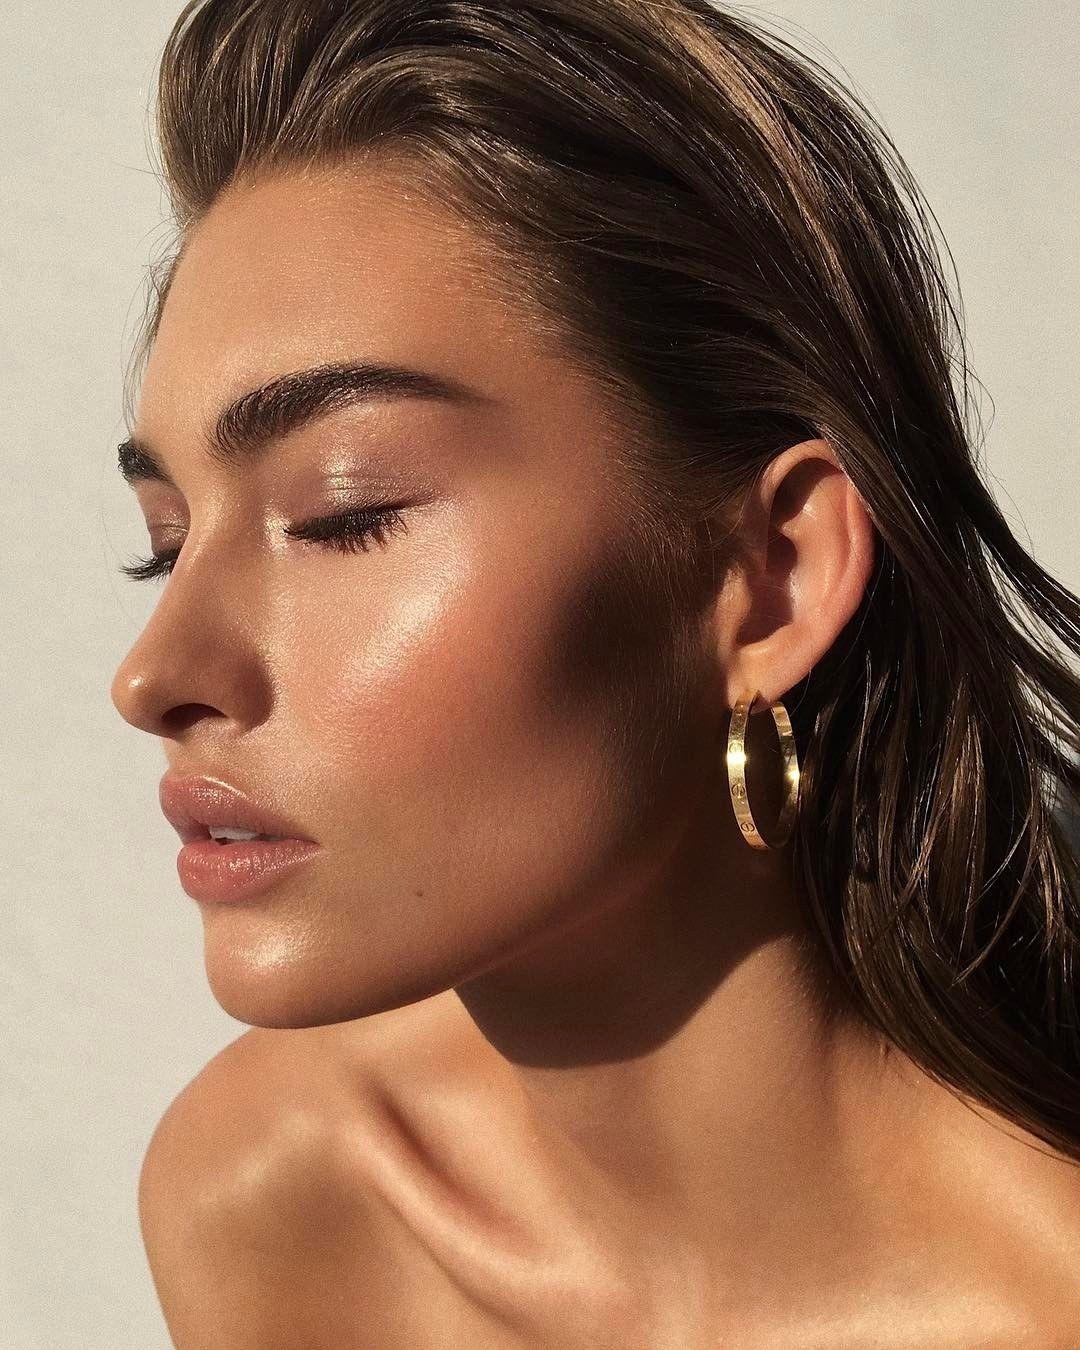 Selena Gomez's Makeup Artist Explains How To Achieve the